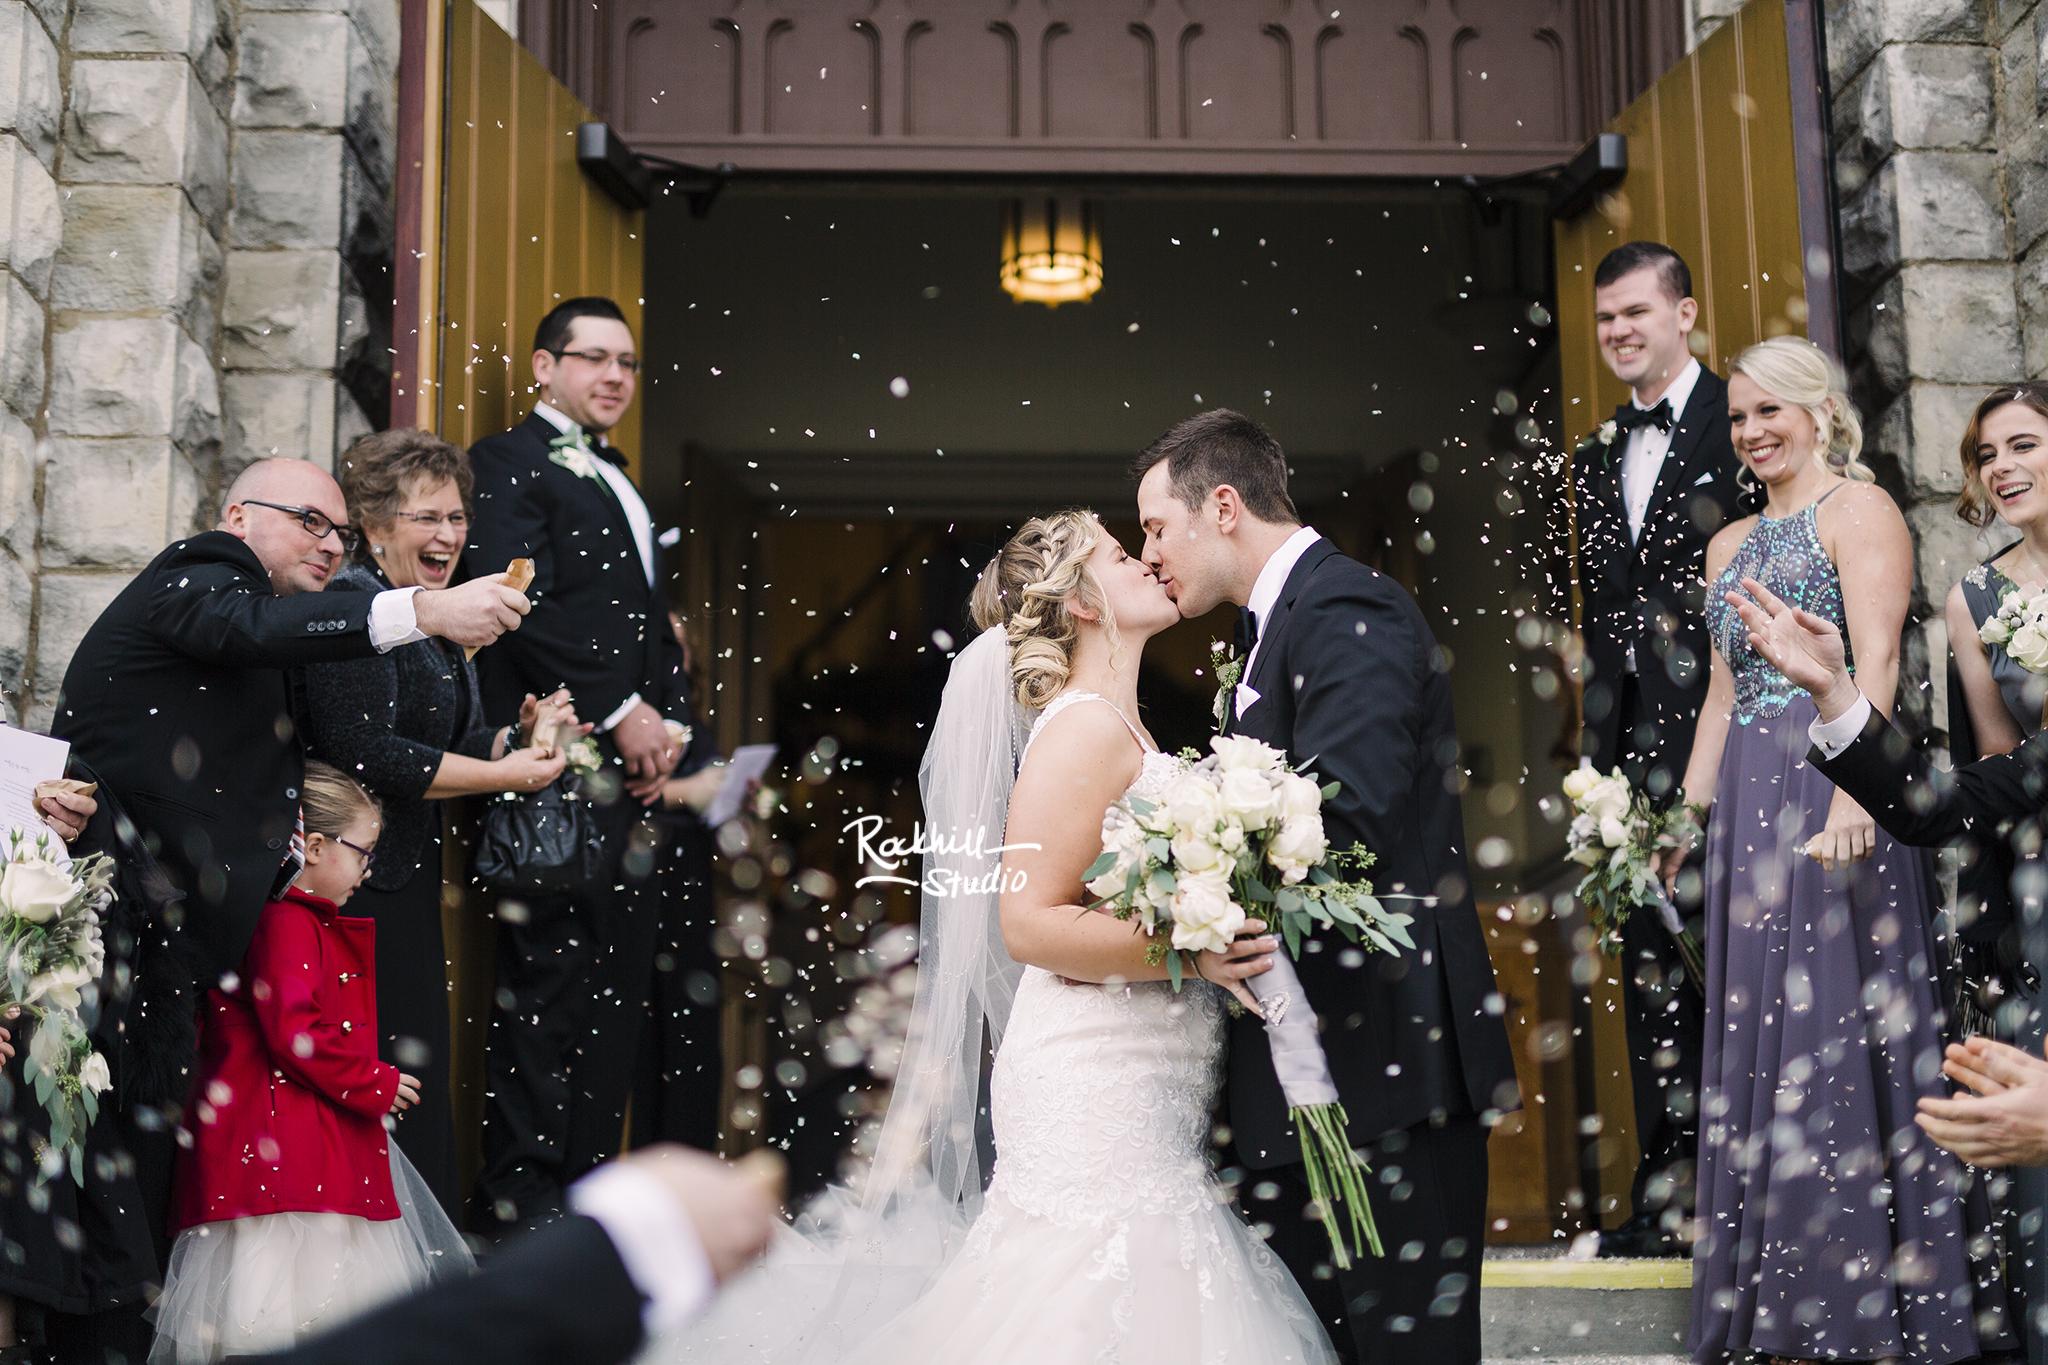 traverse-city-wedding-photographer-rockhill-confetti-nr1.jpg